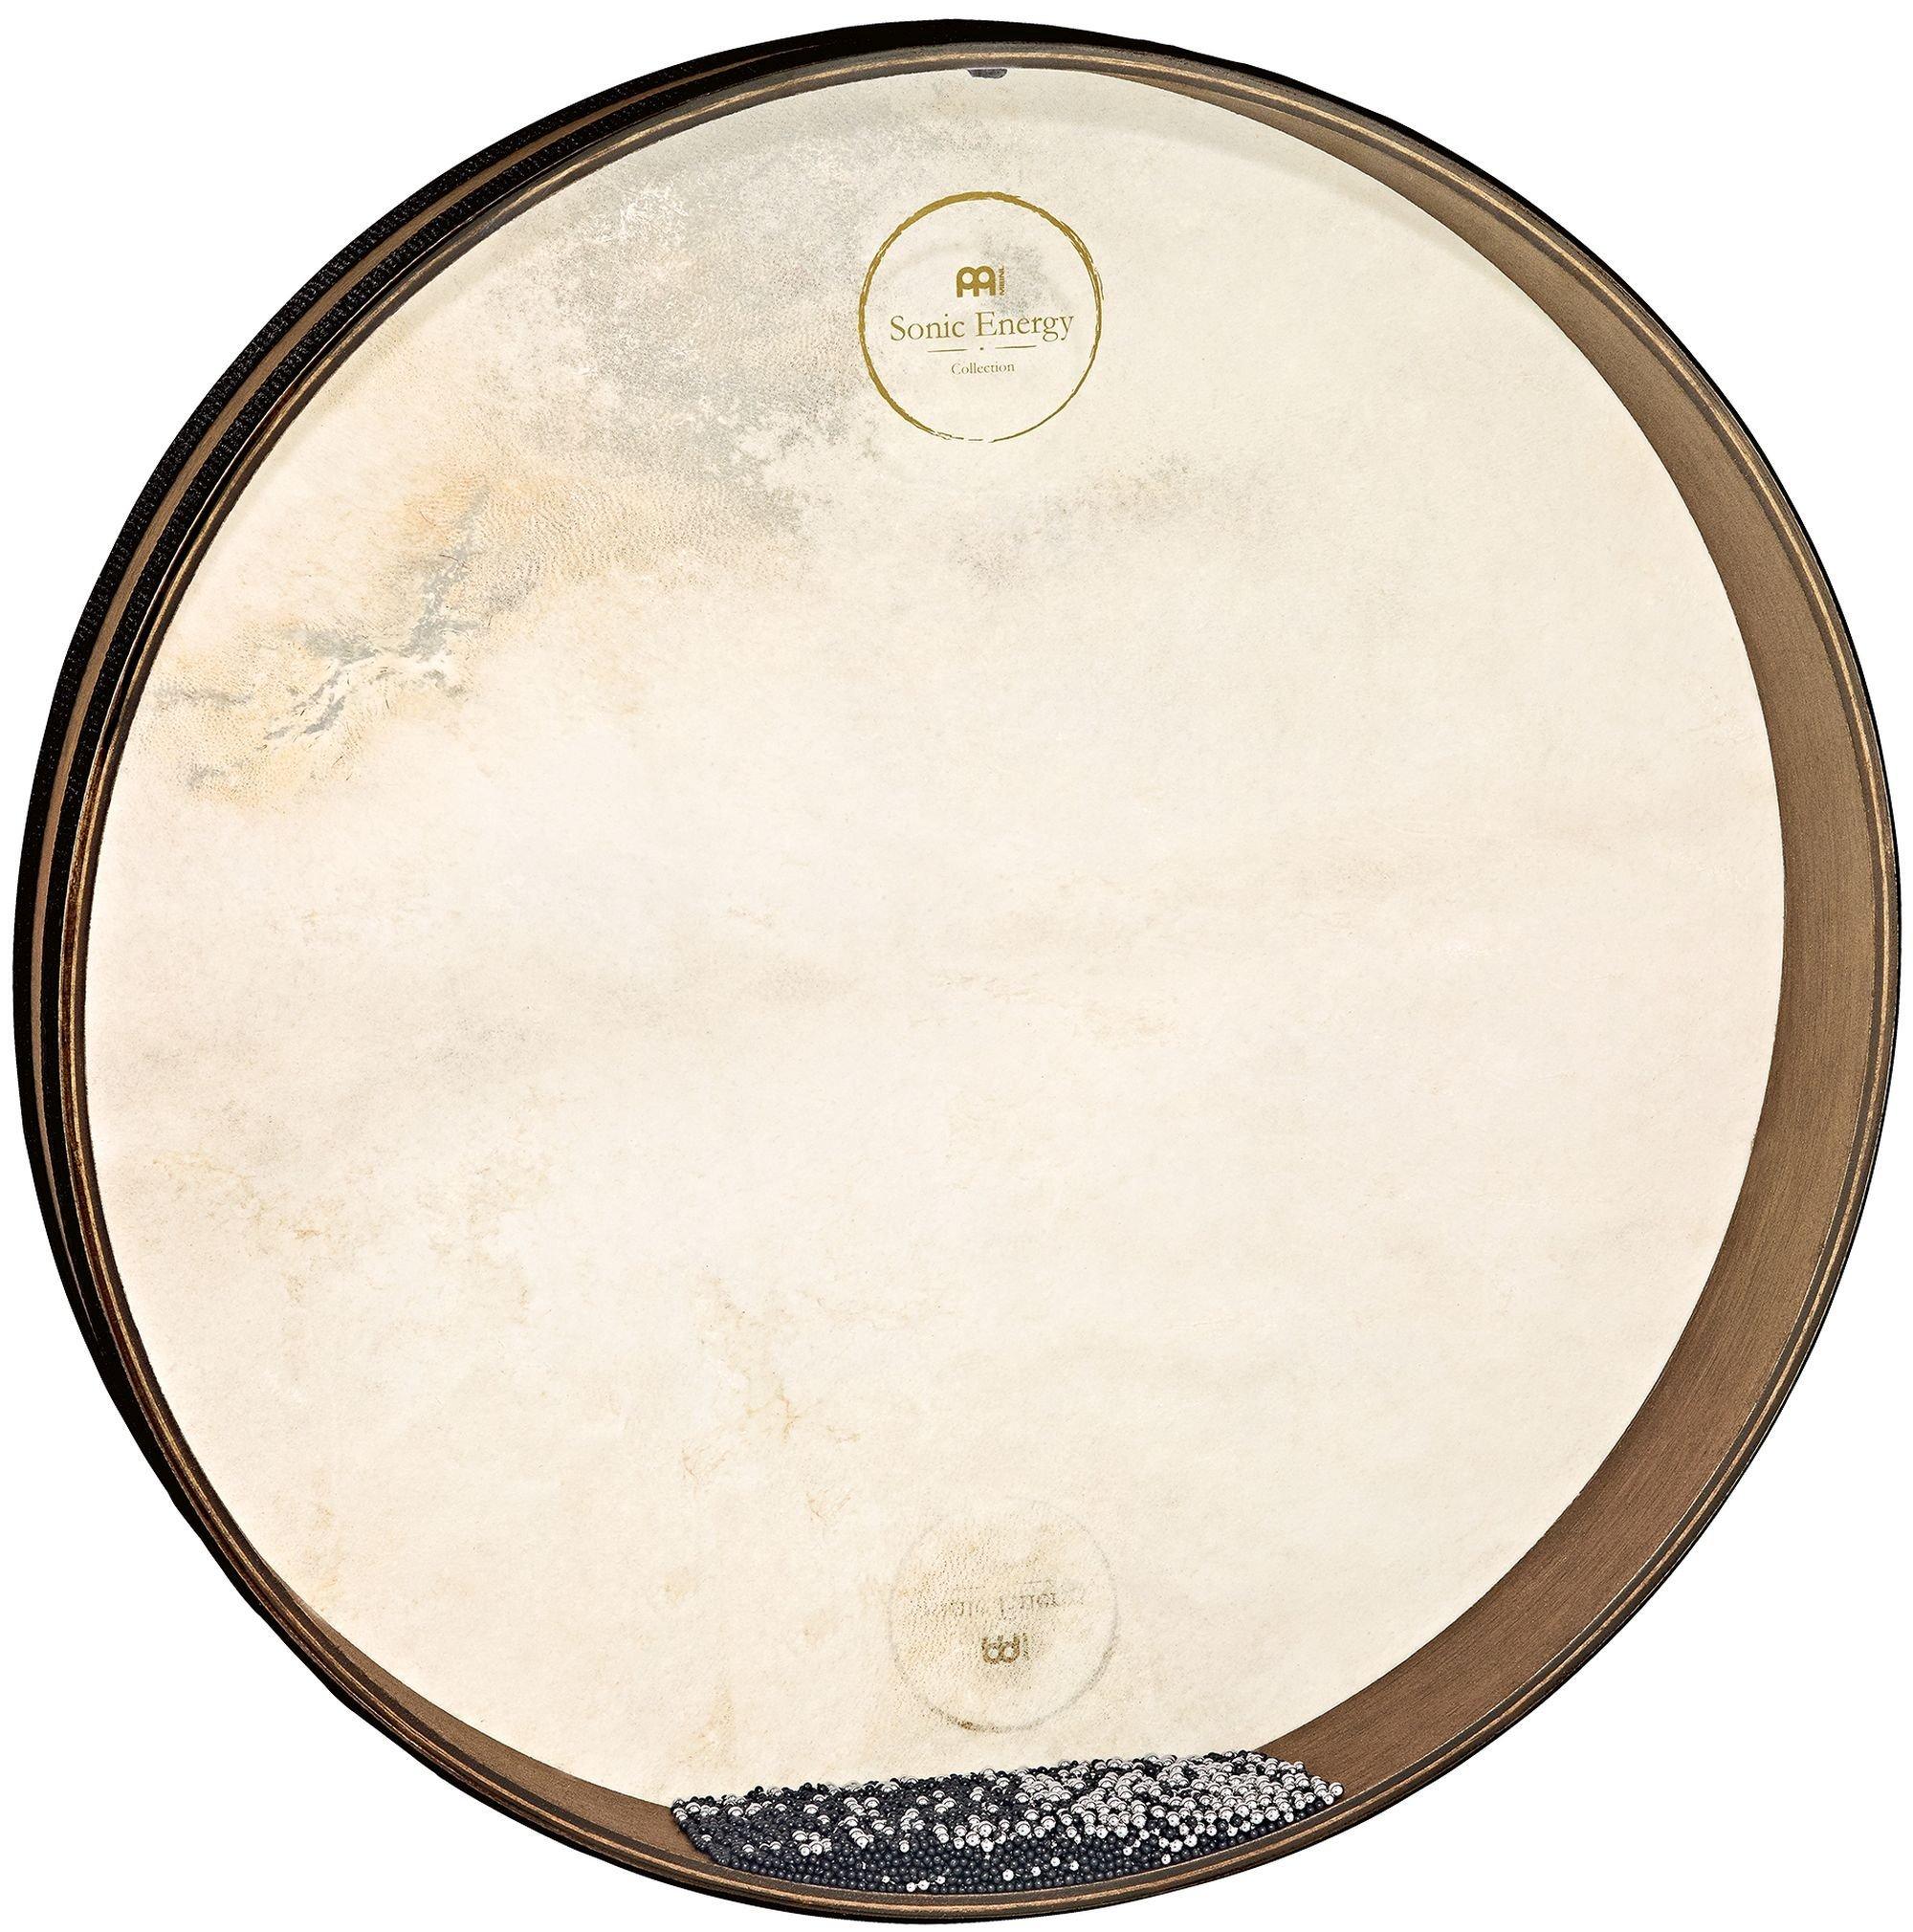 Meinl Sonic Energy WD18WB 18-Inch Wave Drum, Walnut Brown by Meinl Sonic Energy